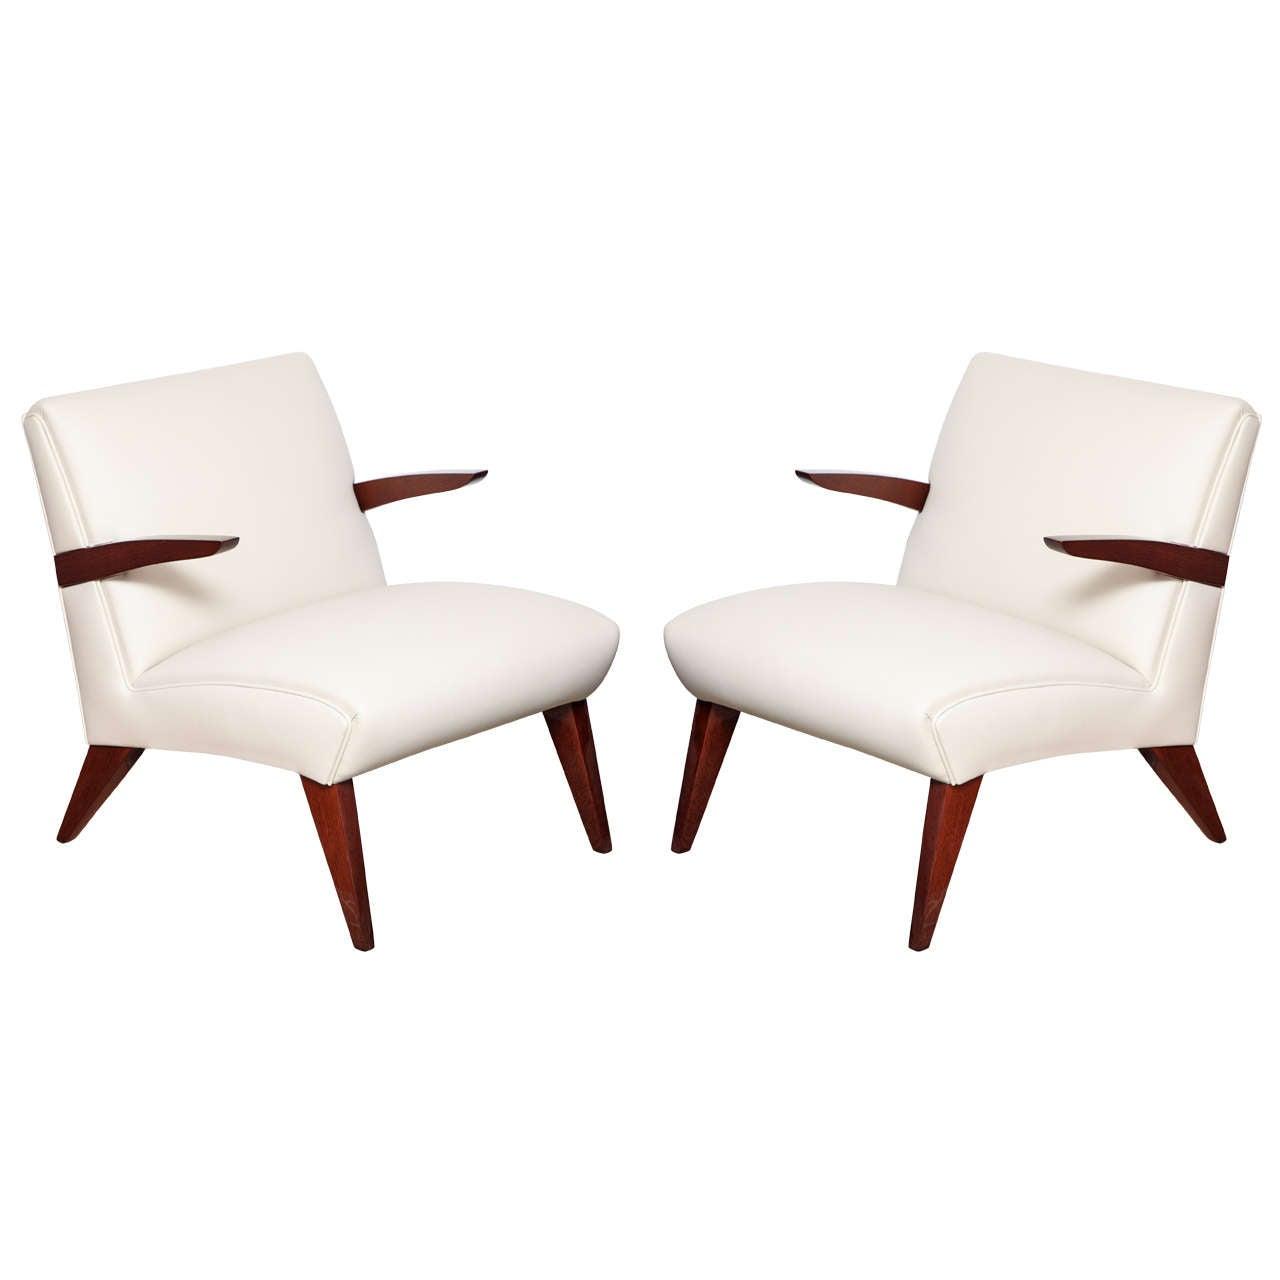 Pair of Art Deco Streamline Lounge Chairs 1